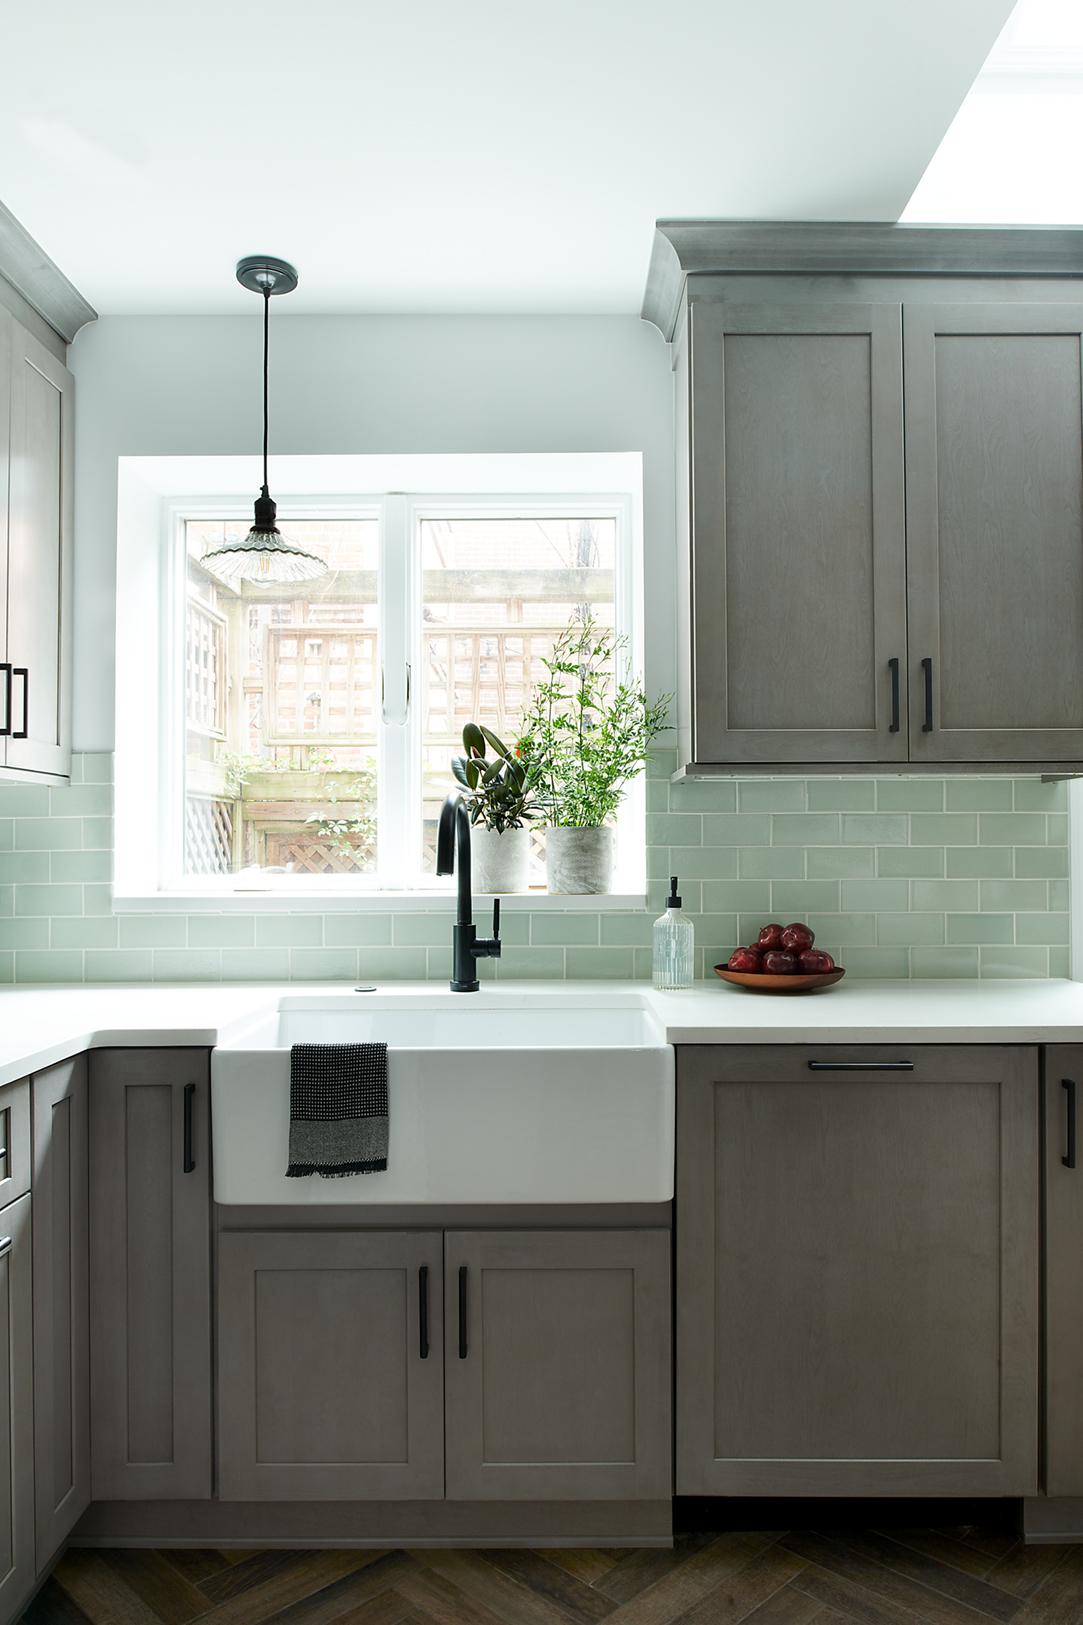 rittenhouse_lowres_kitchen_01_v2.jpg